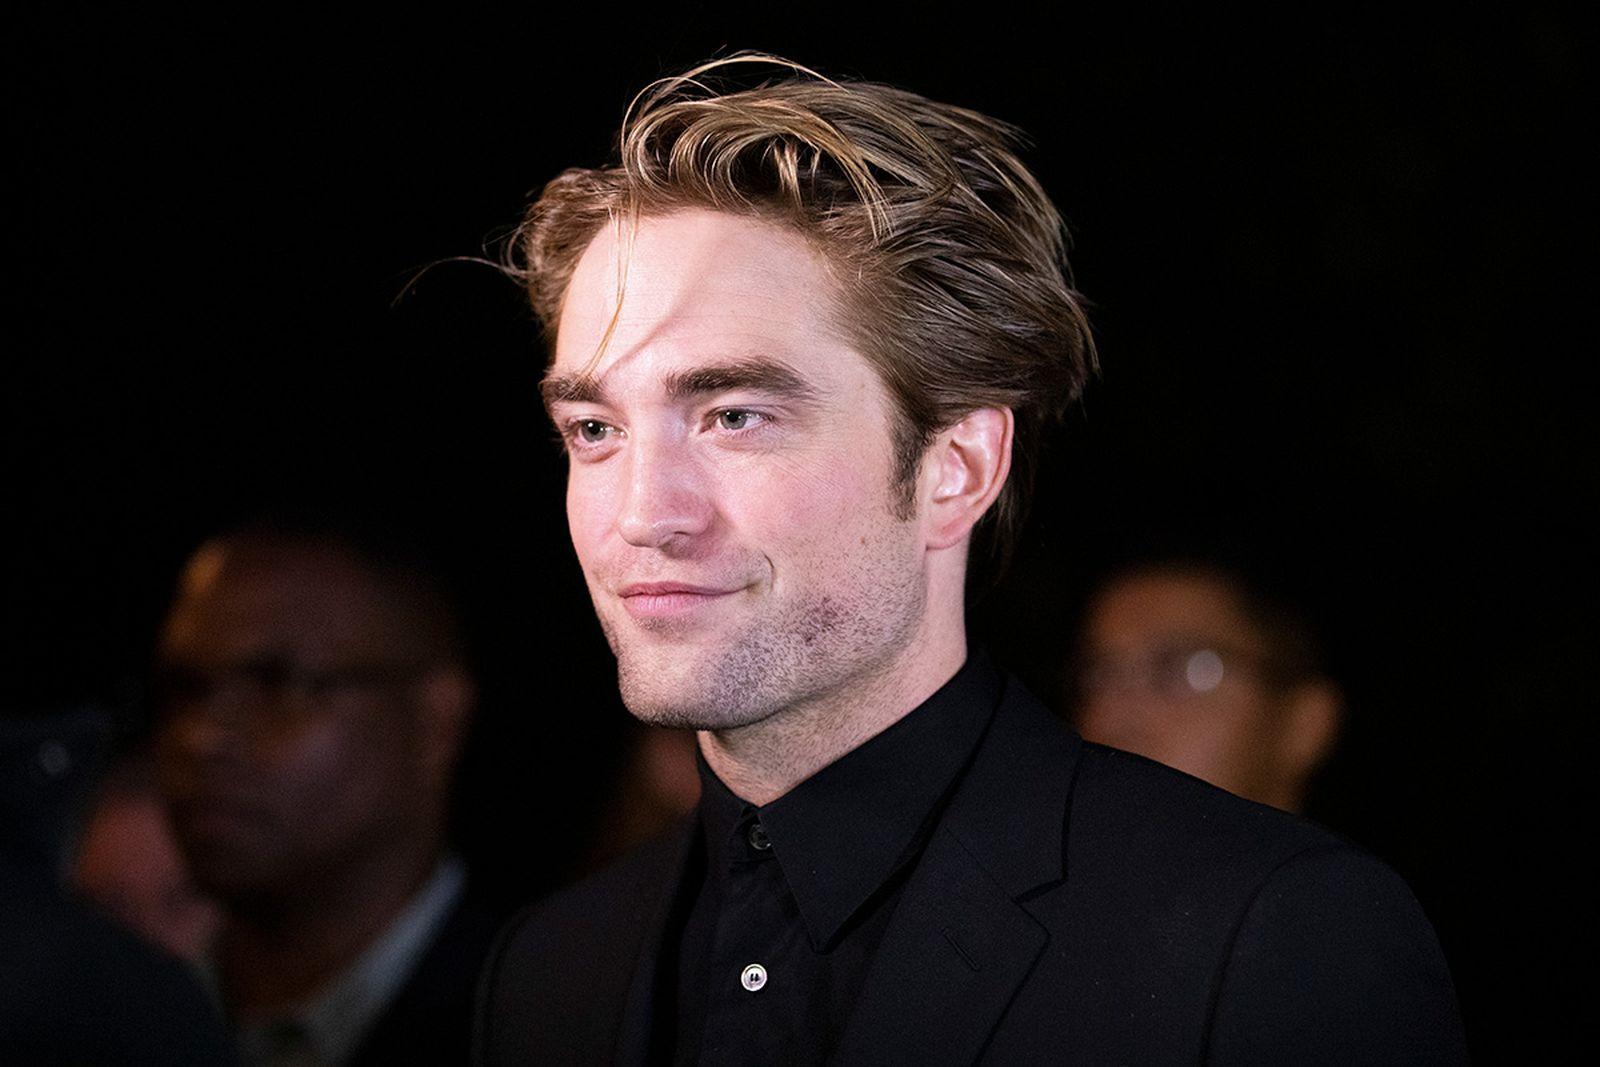 Robert Pattinson on the red carpet, black background